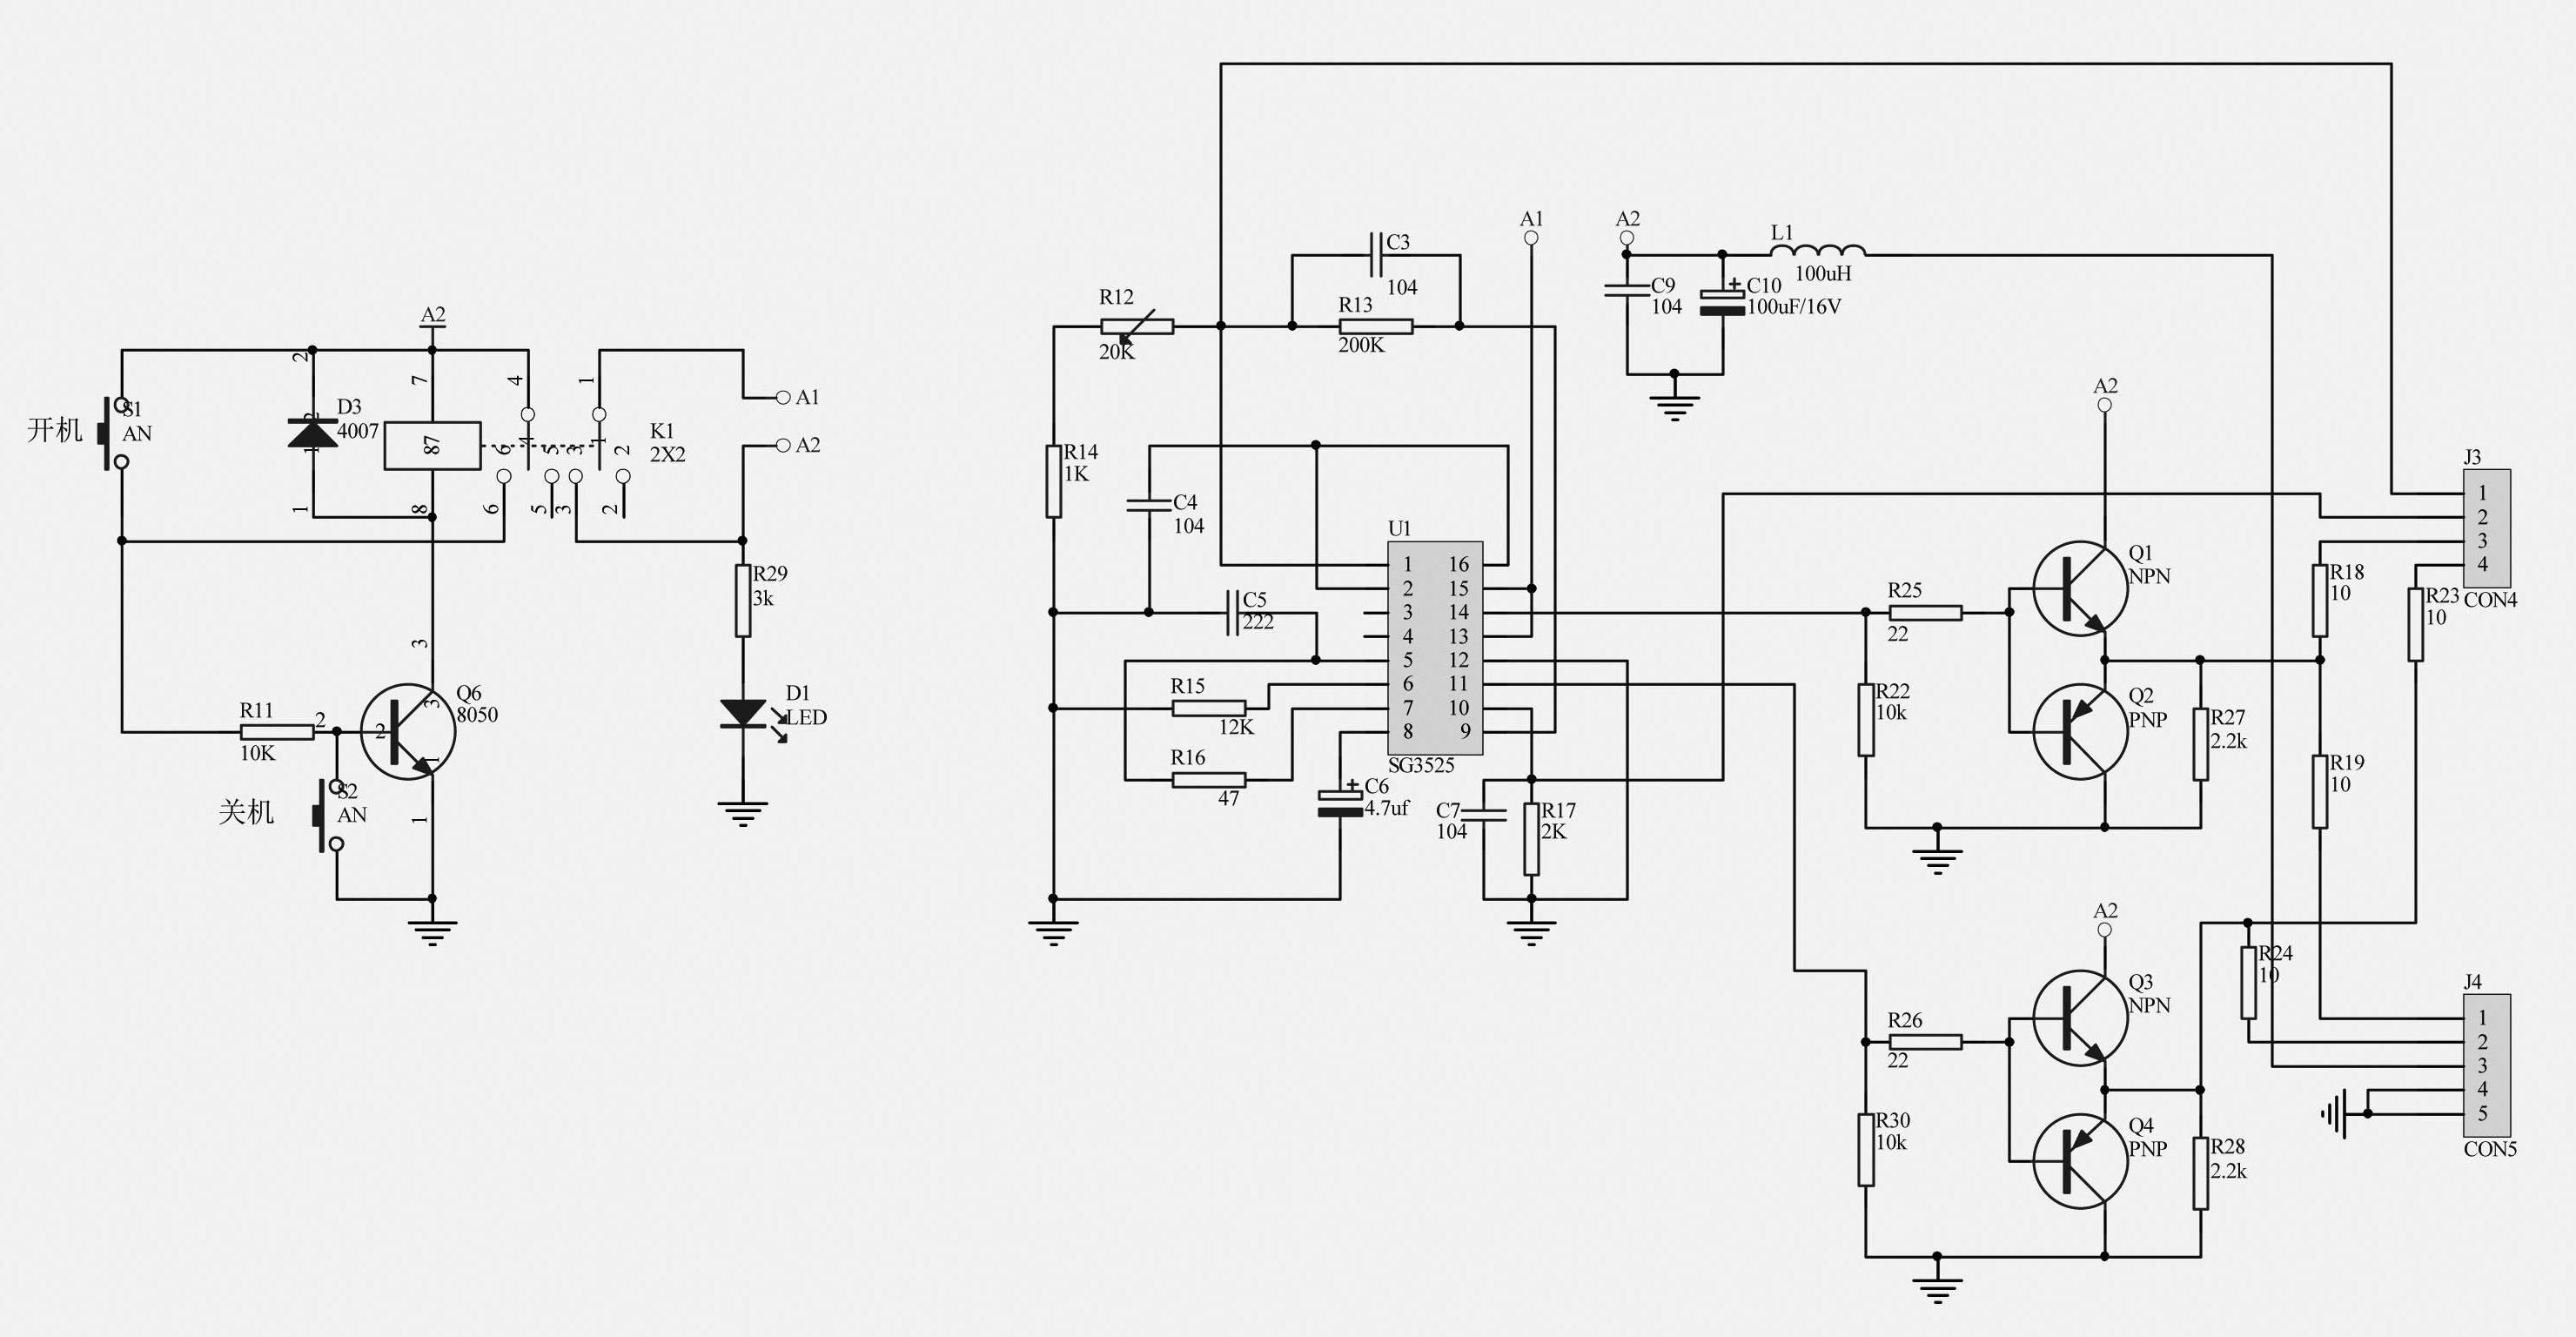 220v To 110v Wiring Diagram Image Home Motor Inverter Copy 1000w Design Dc Distribution Board